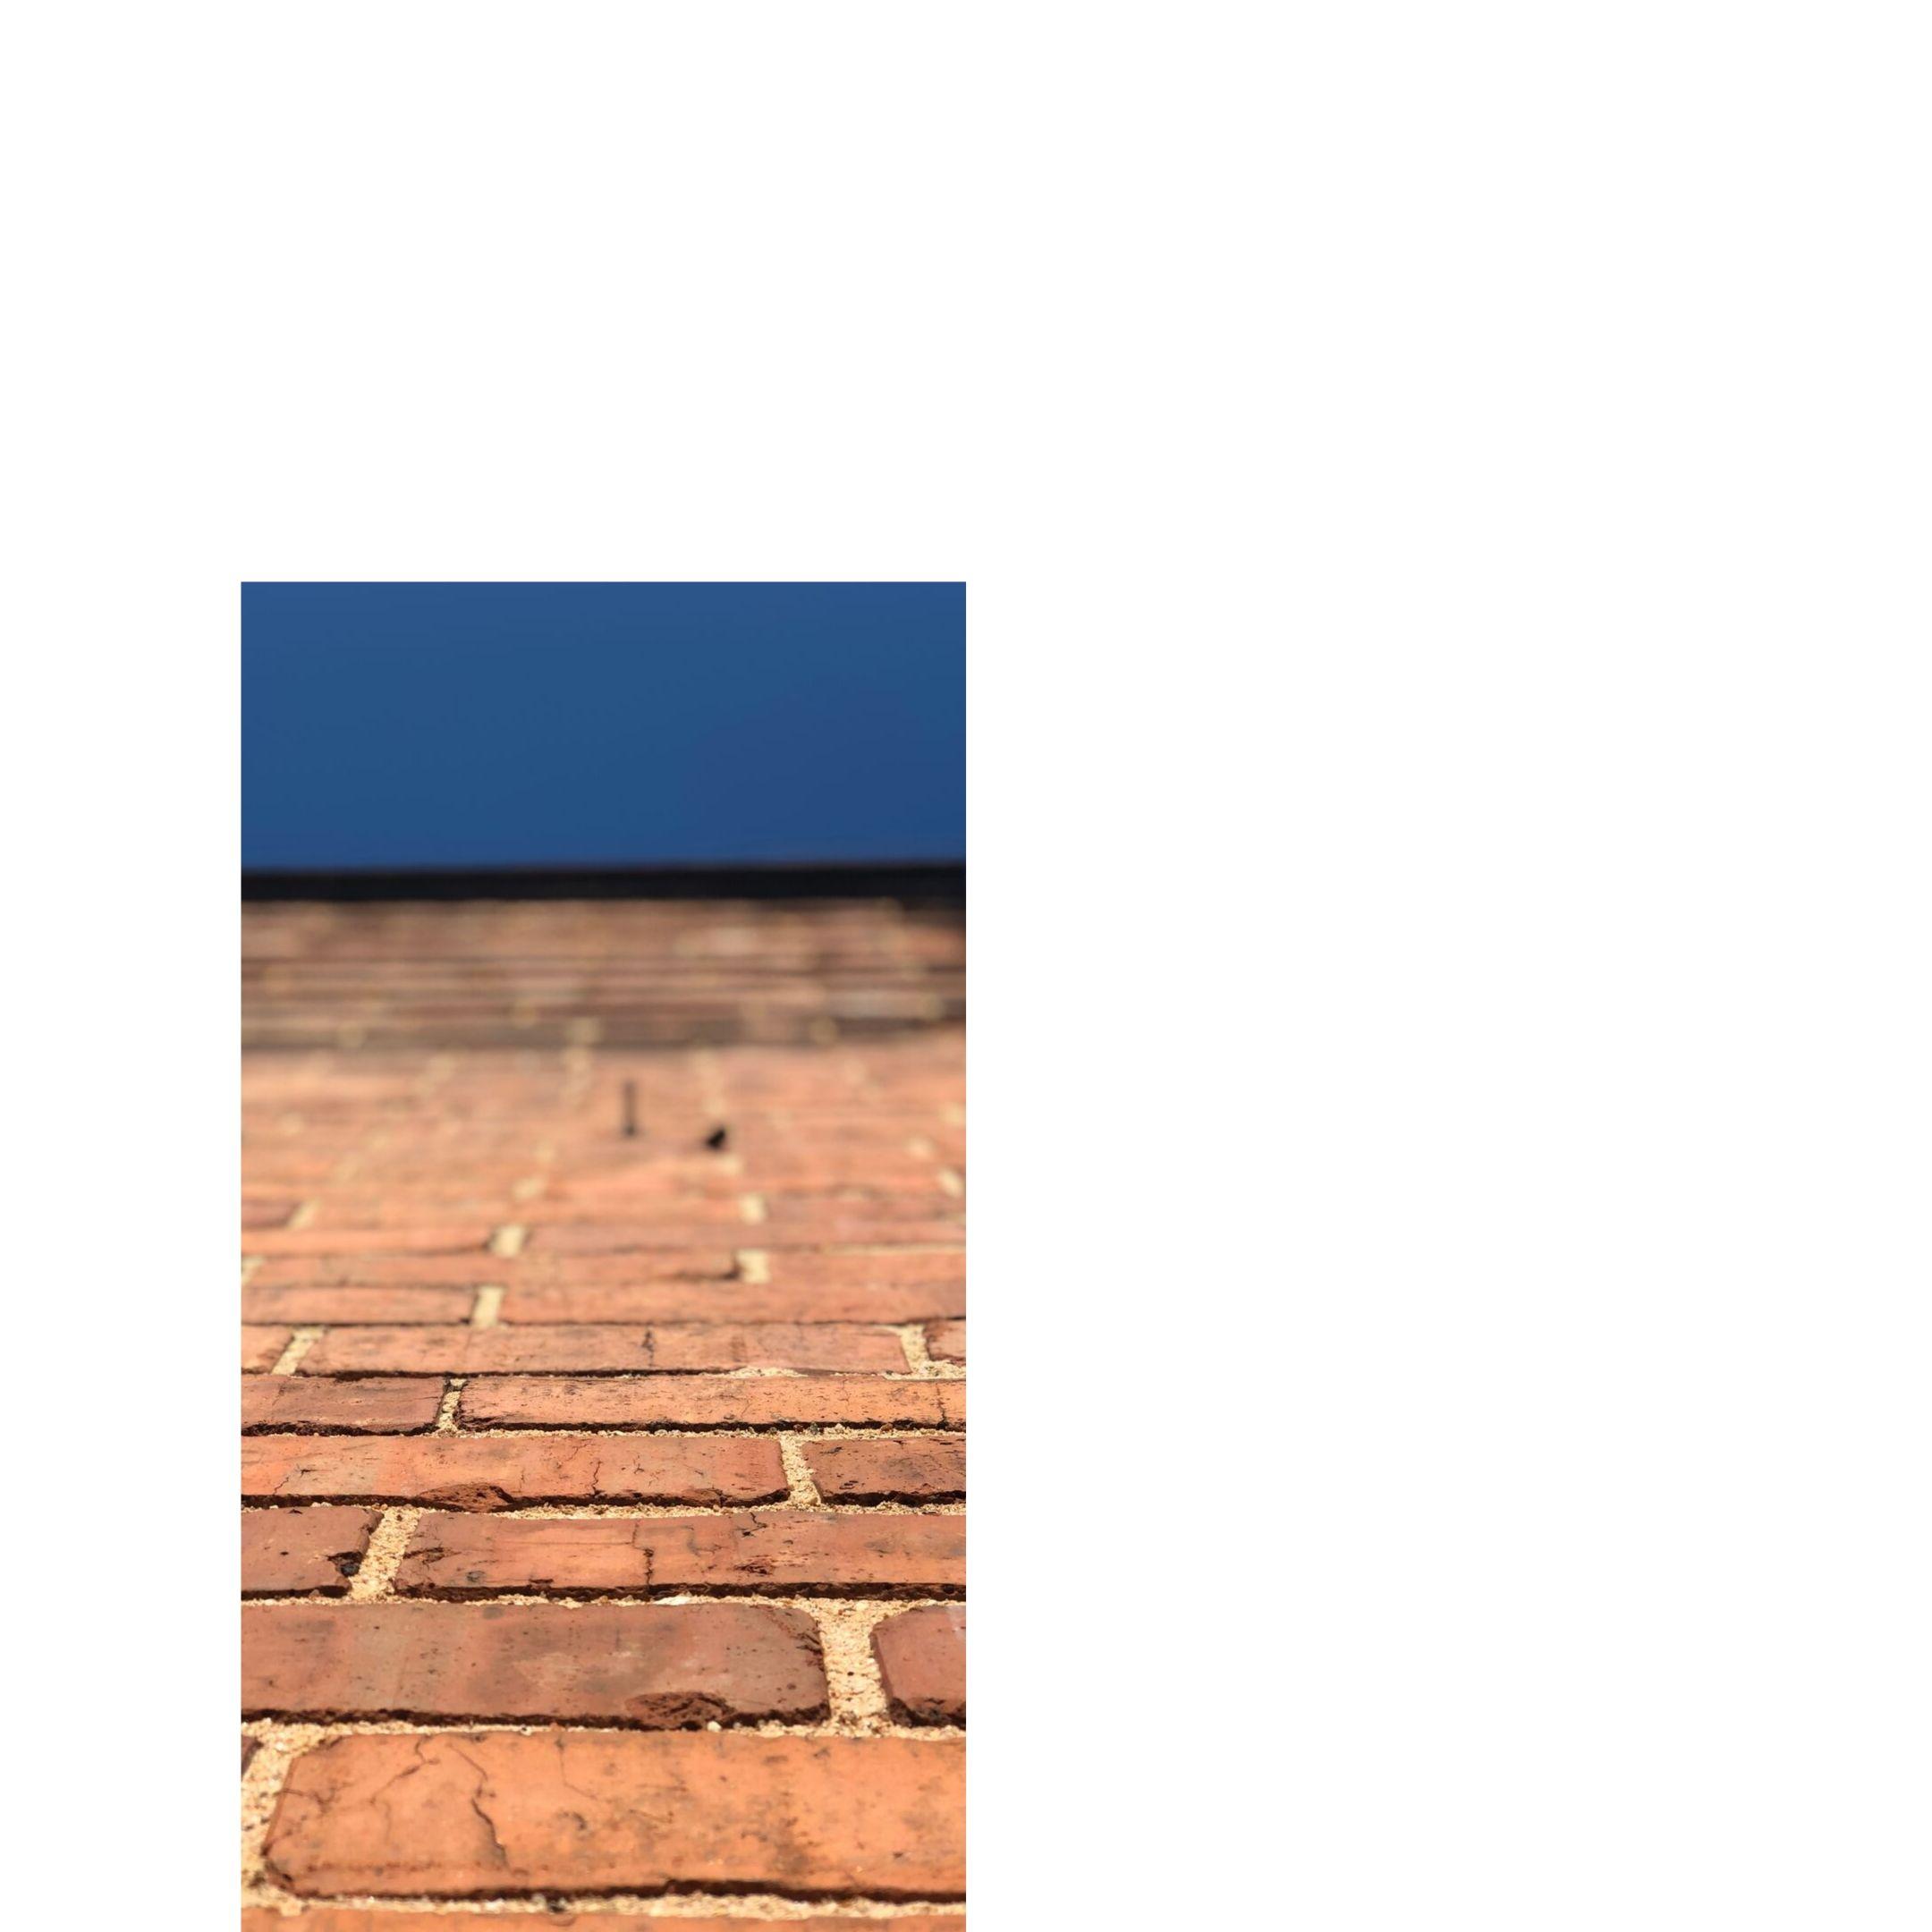 structurally sound stack of bricks